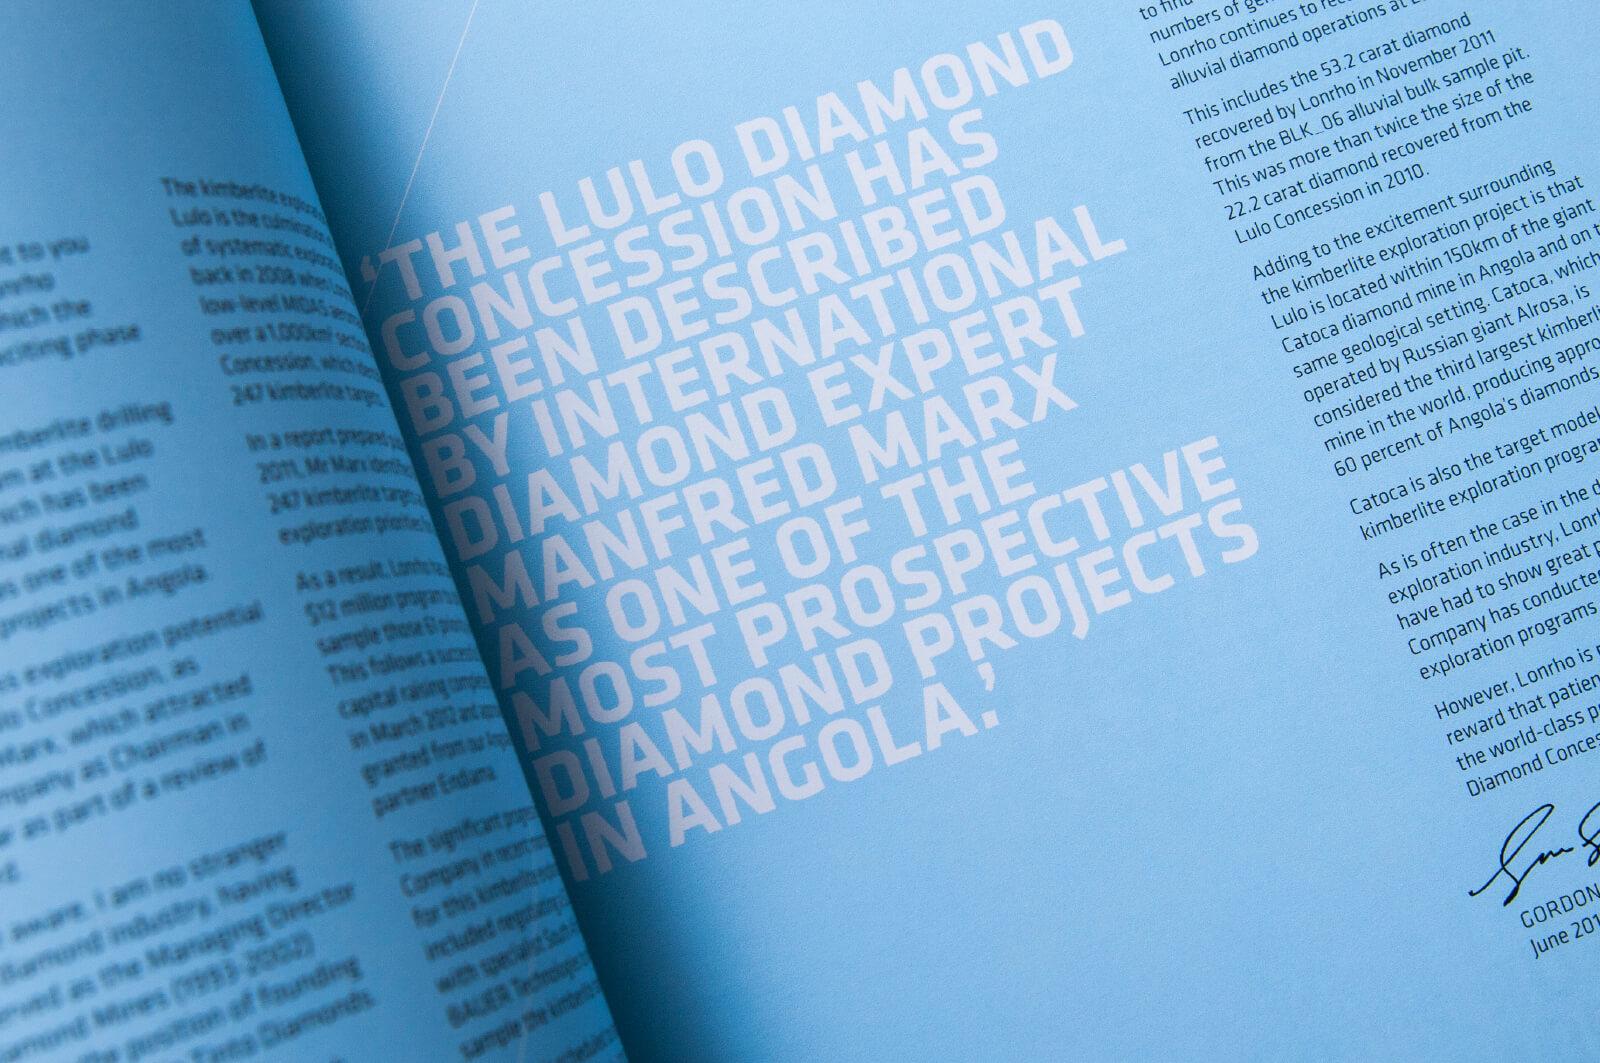 Lonrho-annual-report-2012-3